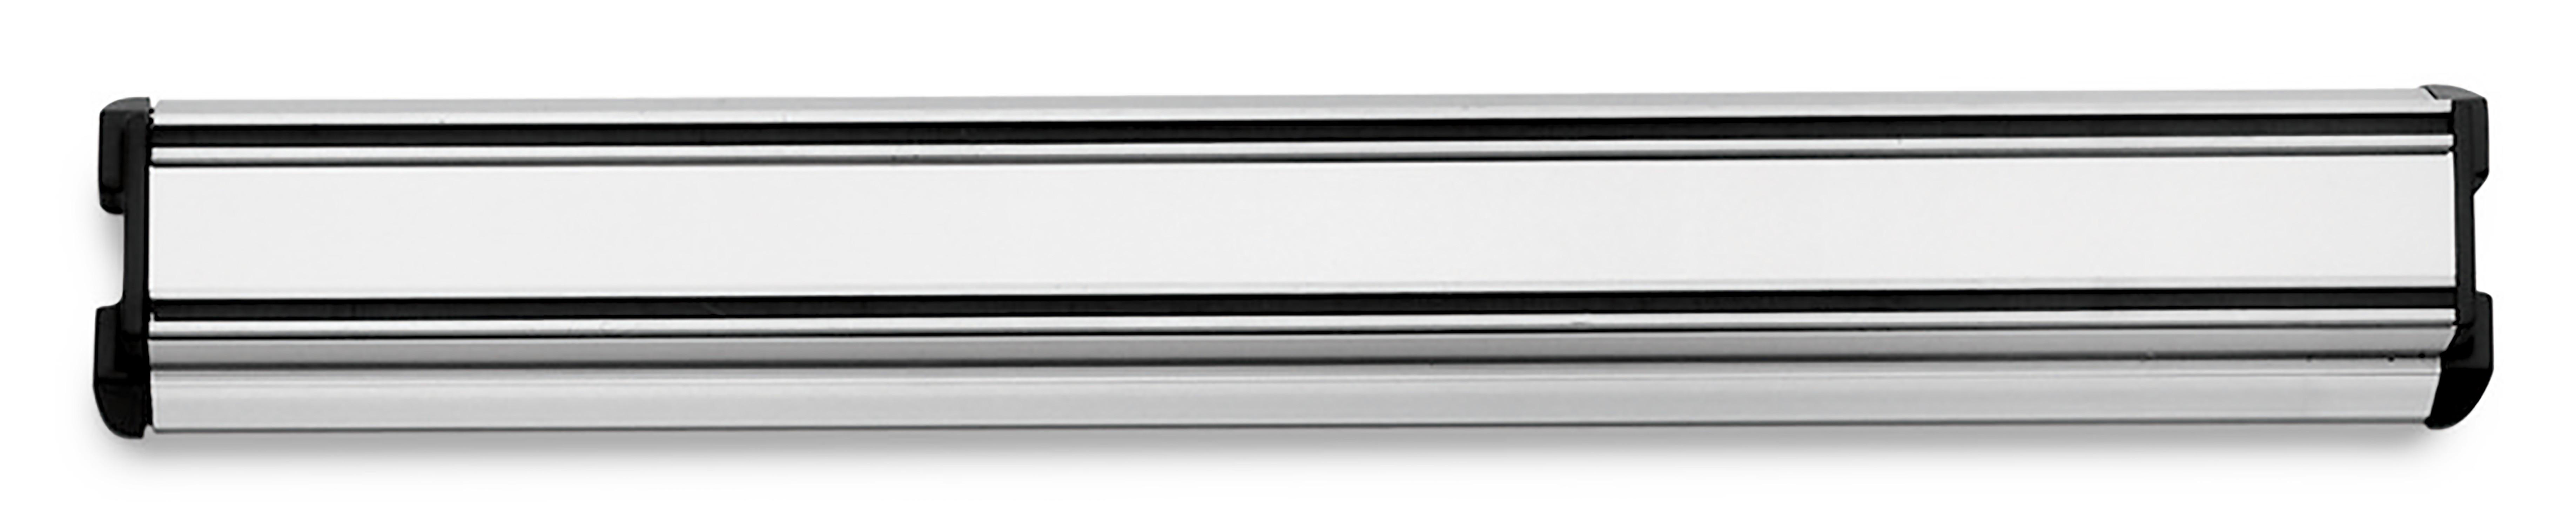 Wüsthof Magnethalter Aluminium 30cm